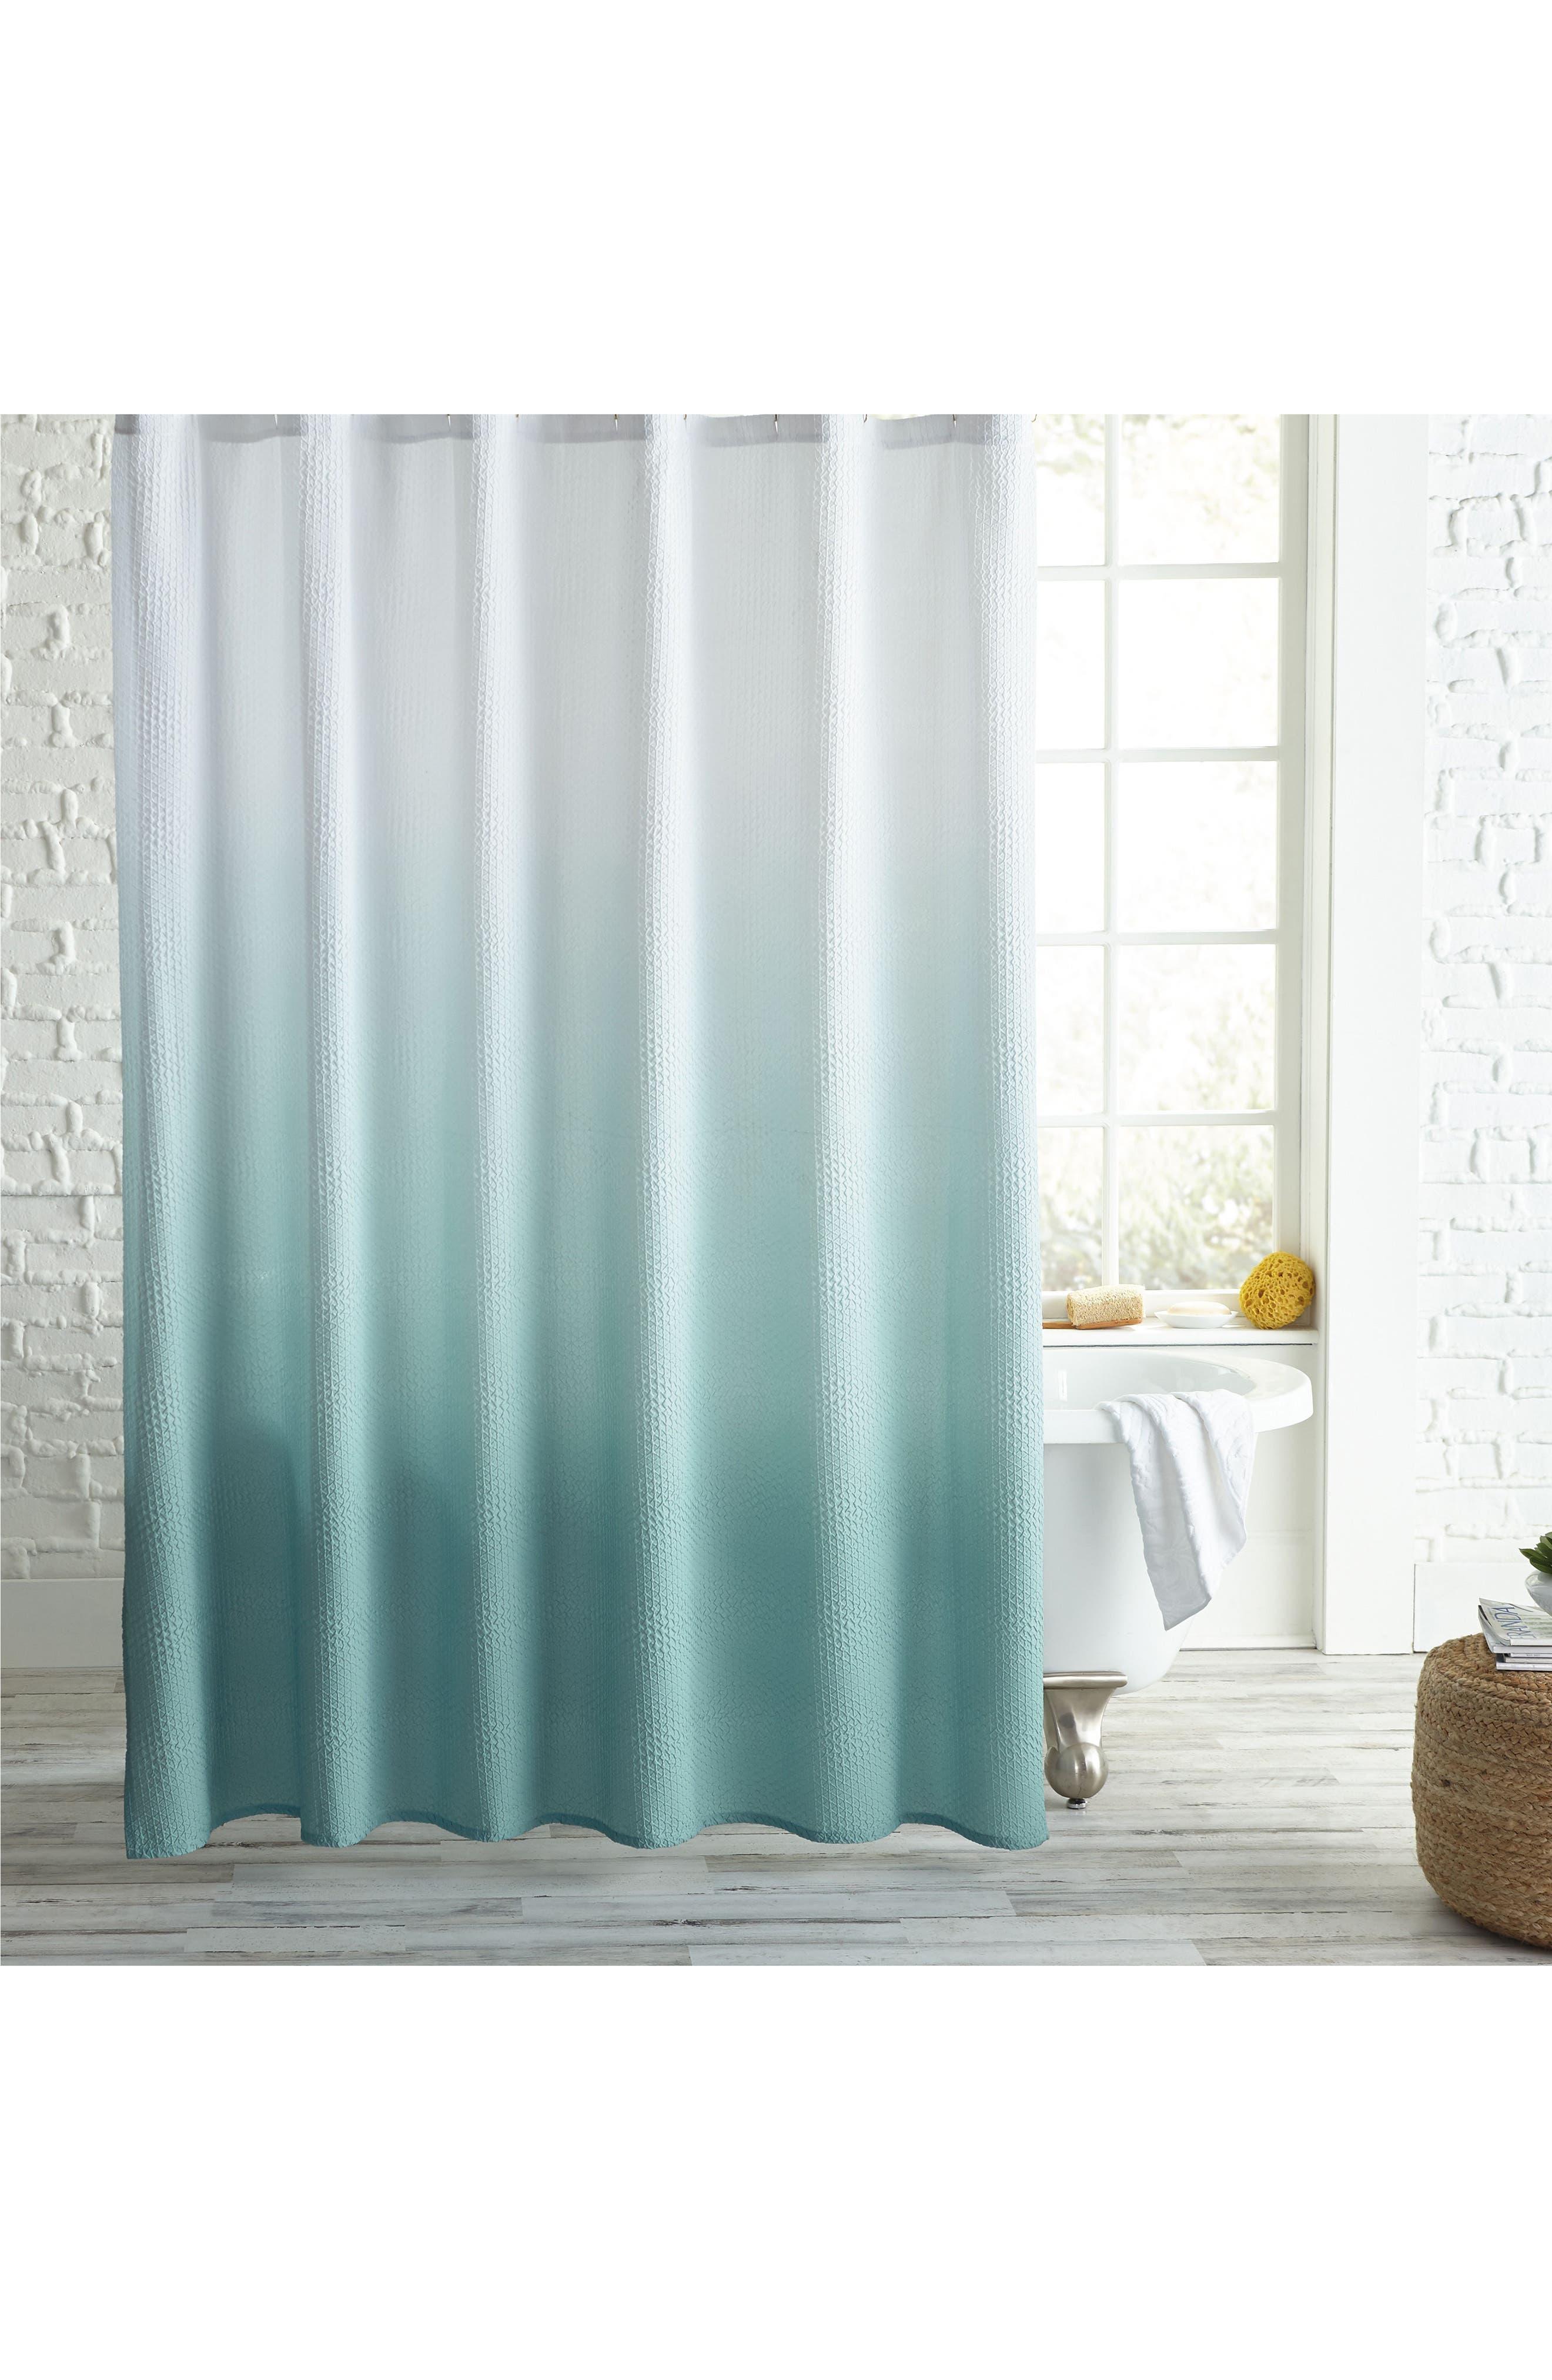 Grey Home, Kitchen, Bedroom & Bathroom Decor   Nordstrom